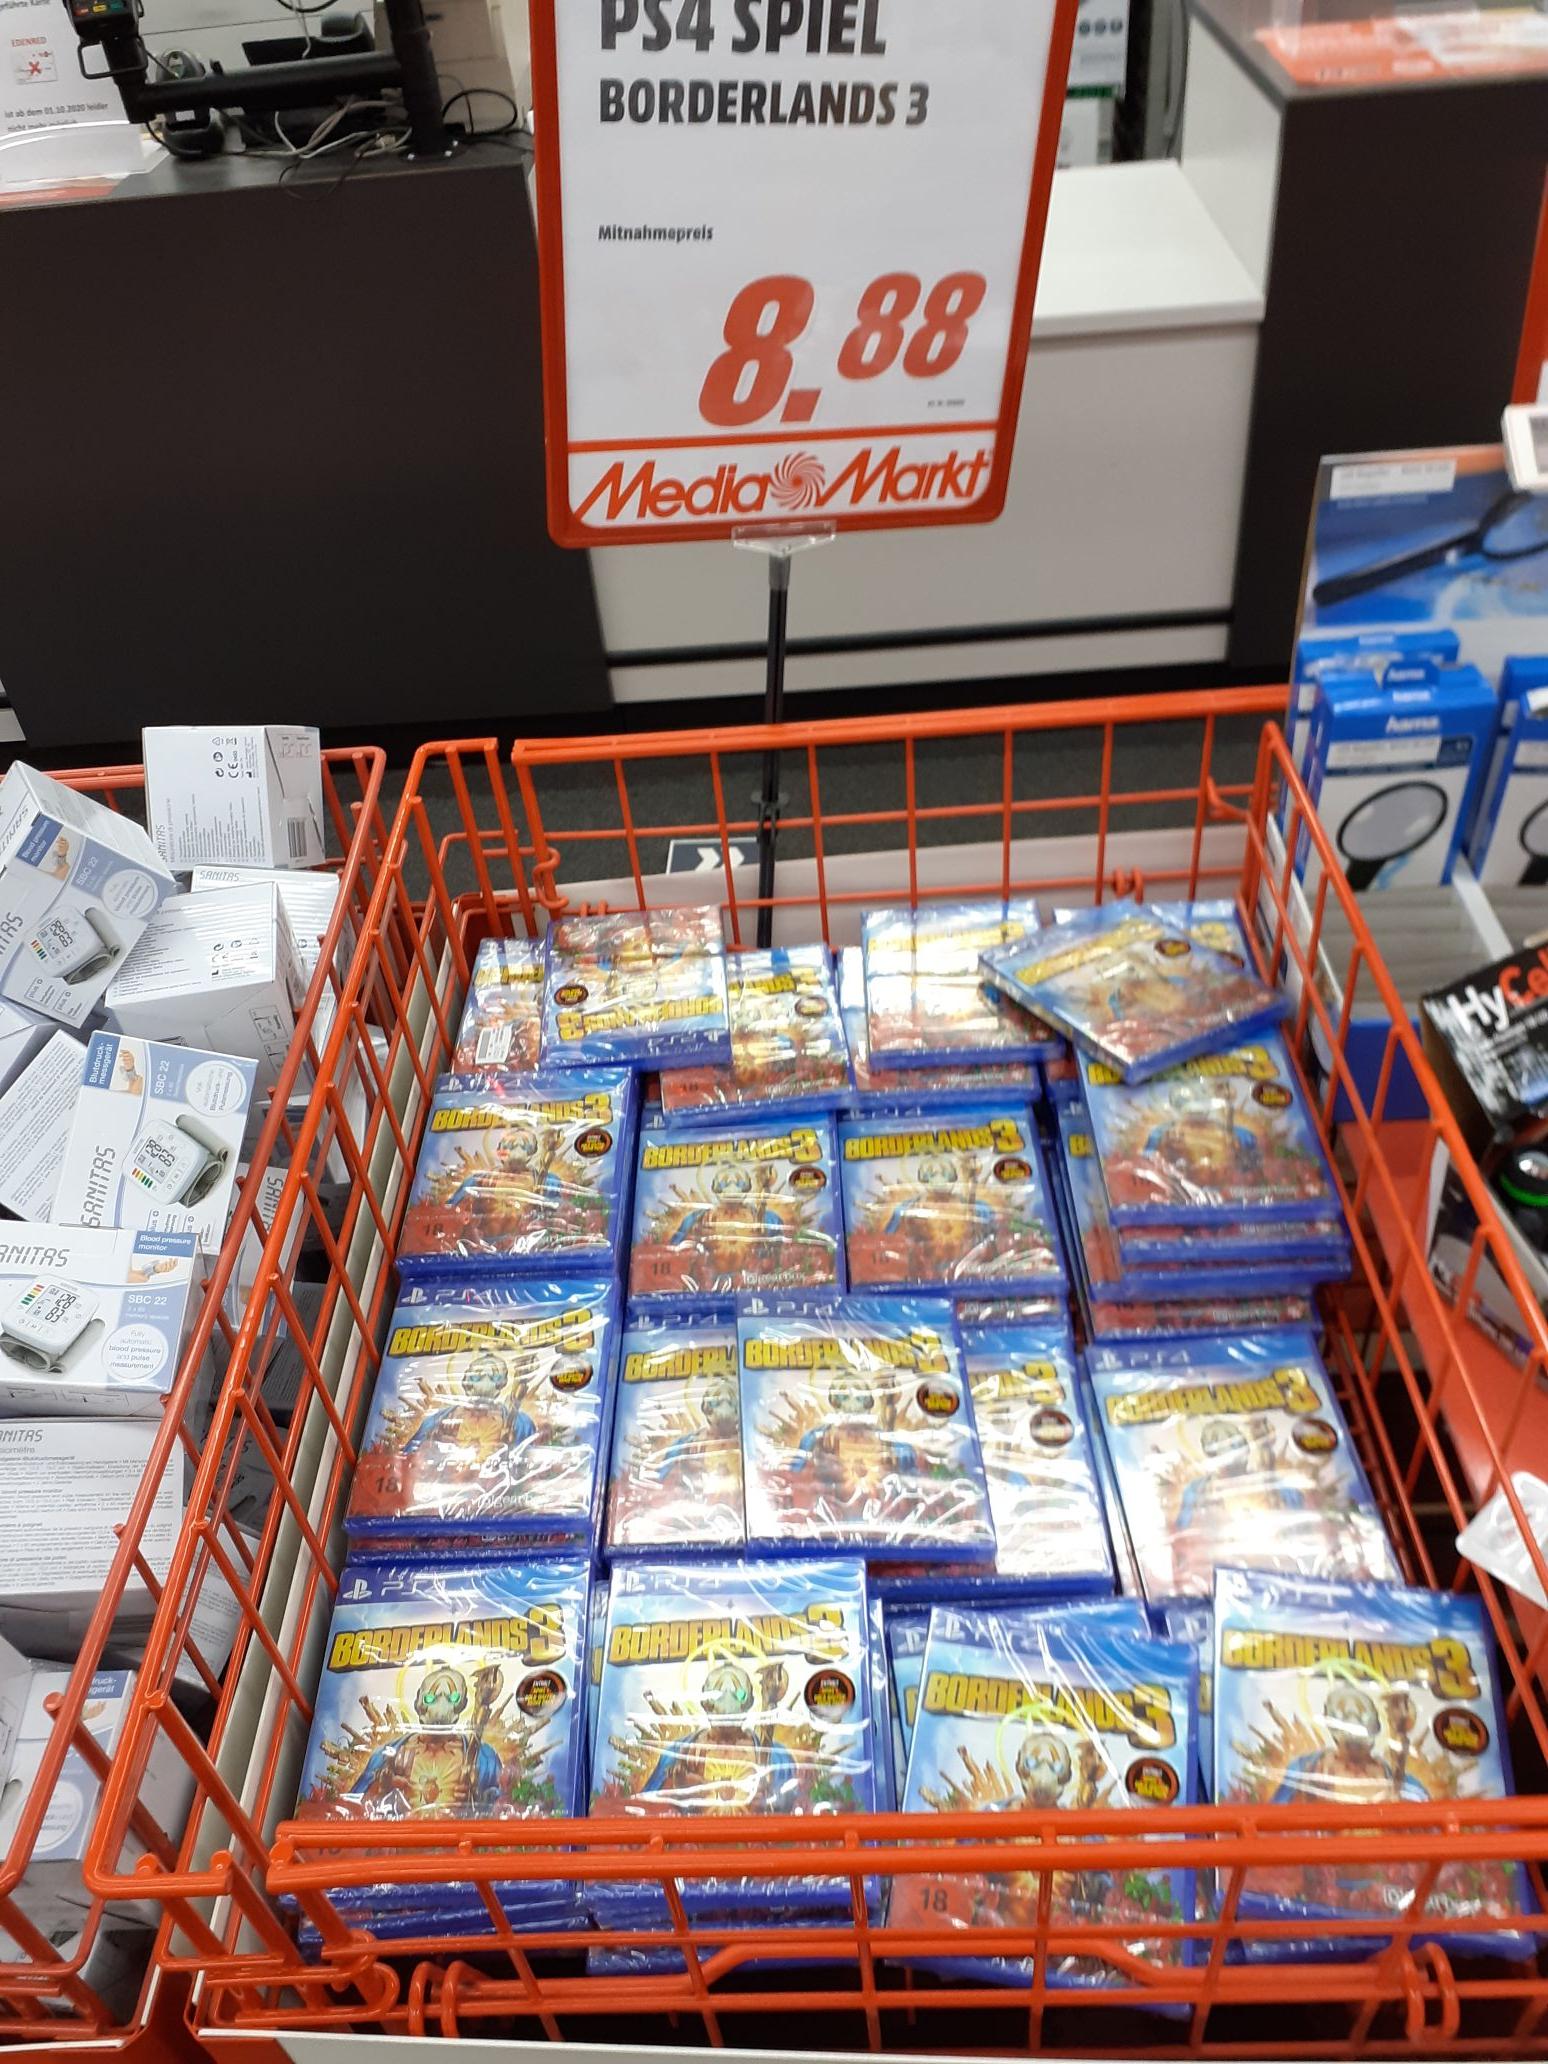 [Lokal Fulda] Media Markt: Borderlands 3 für PS4